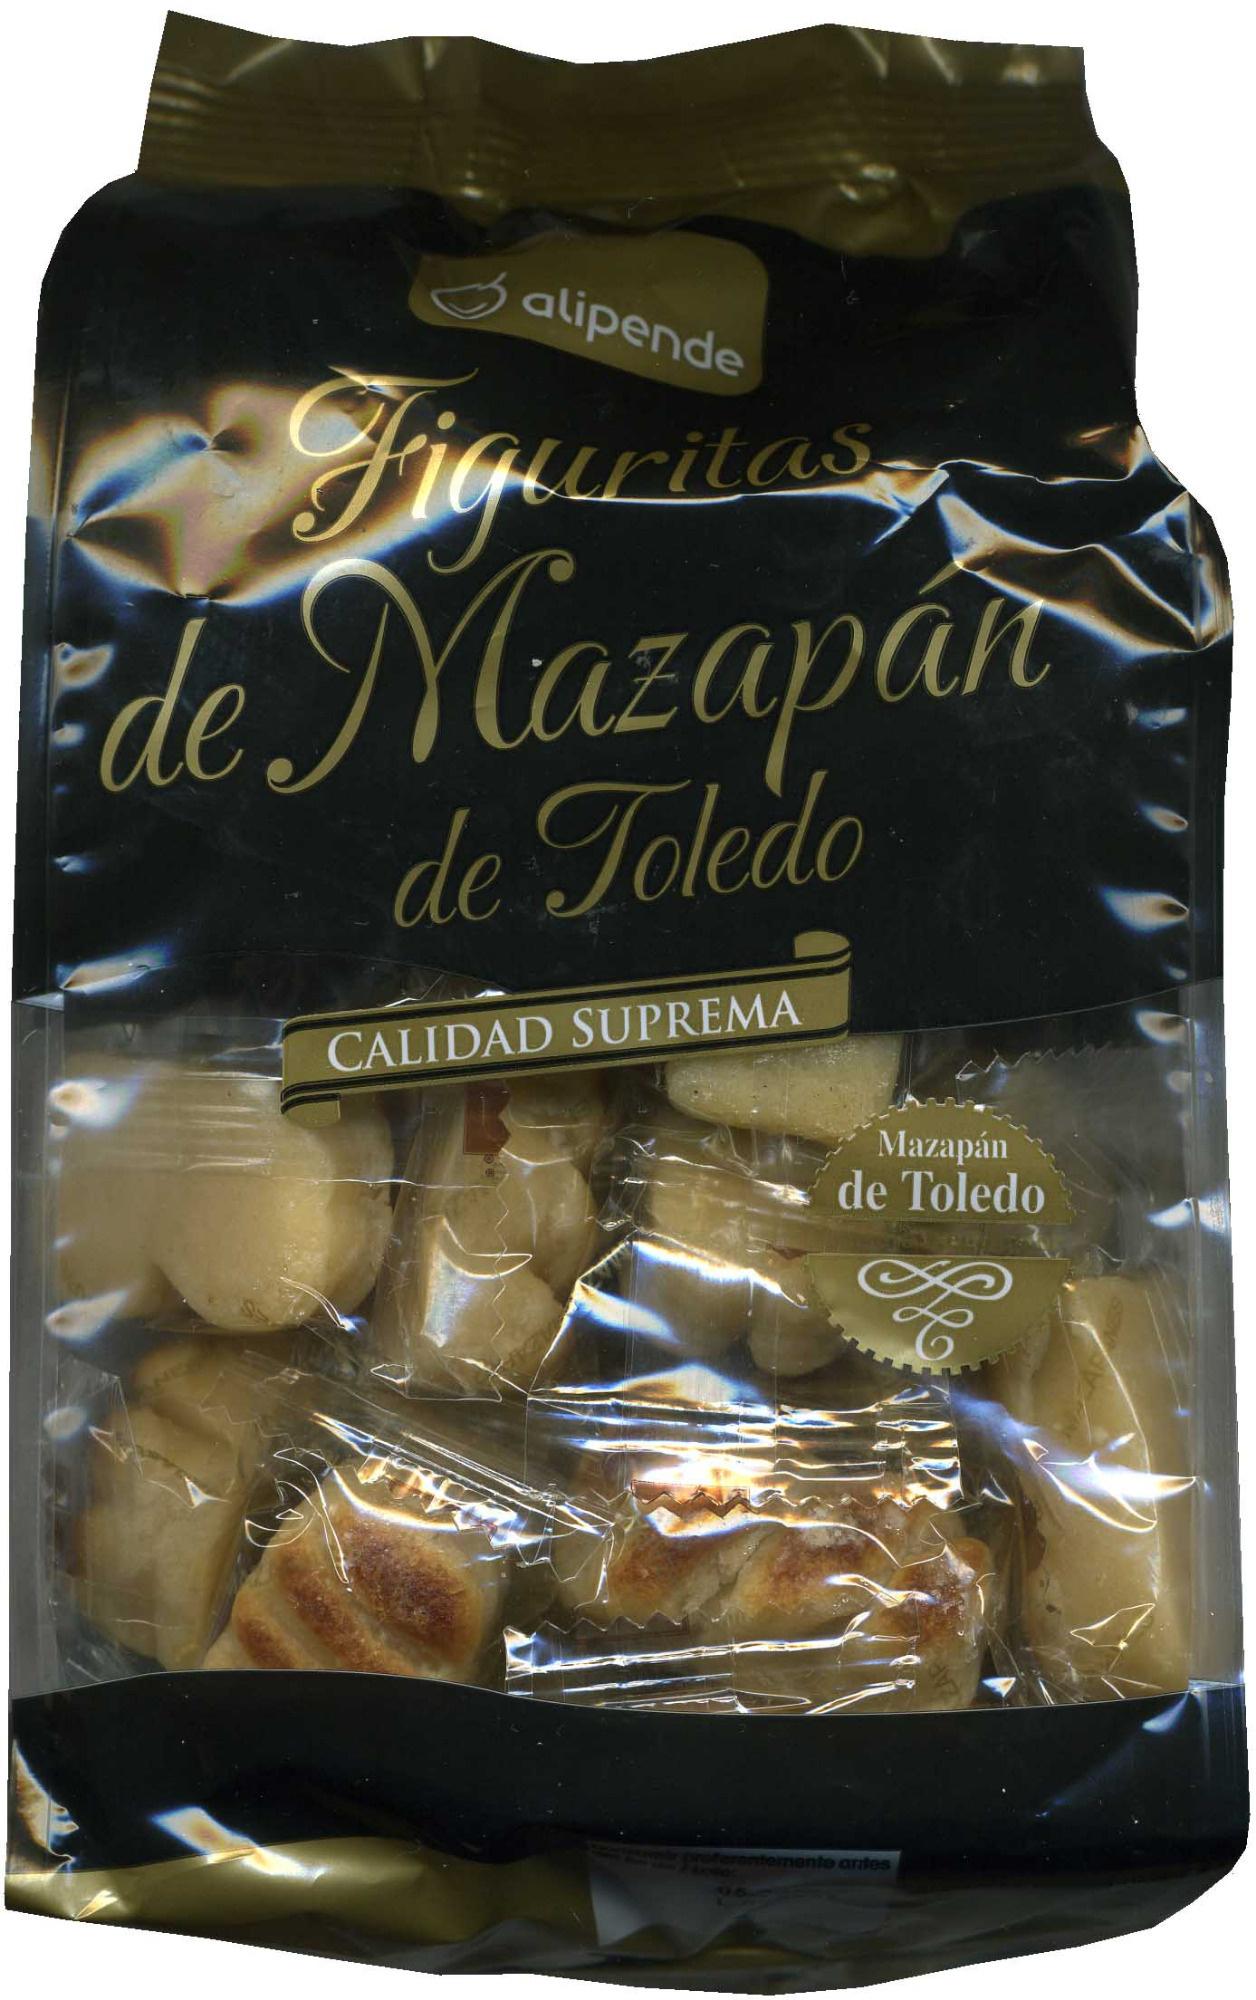 Figuritas de mazapán de Toledo - Producto